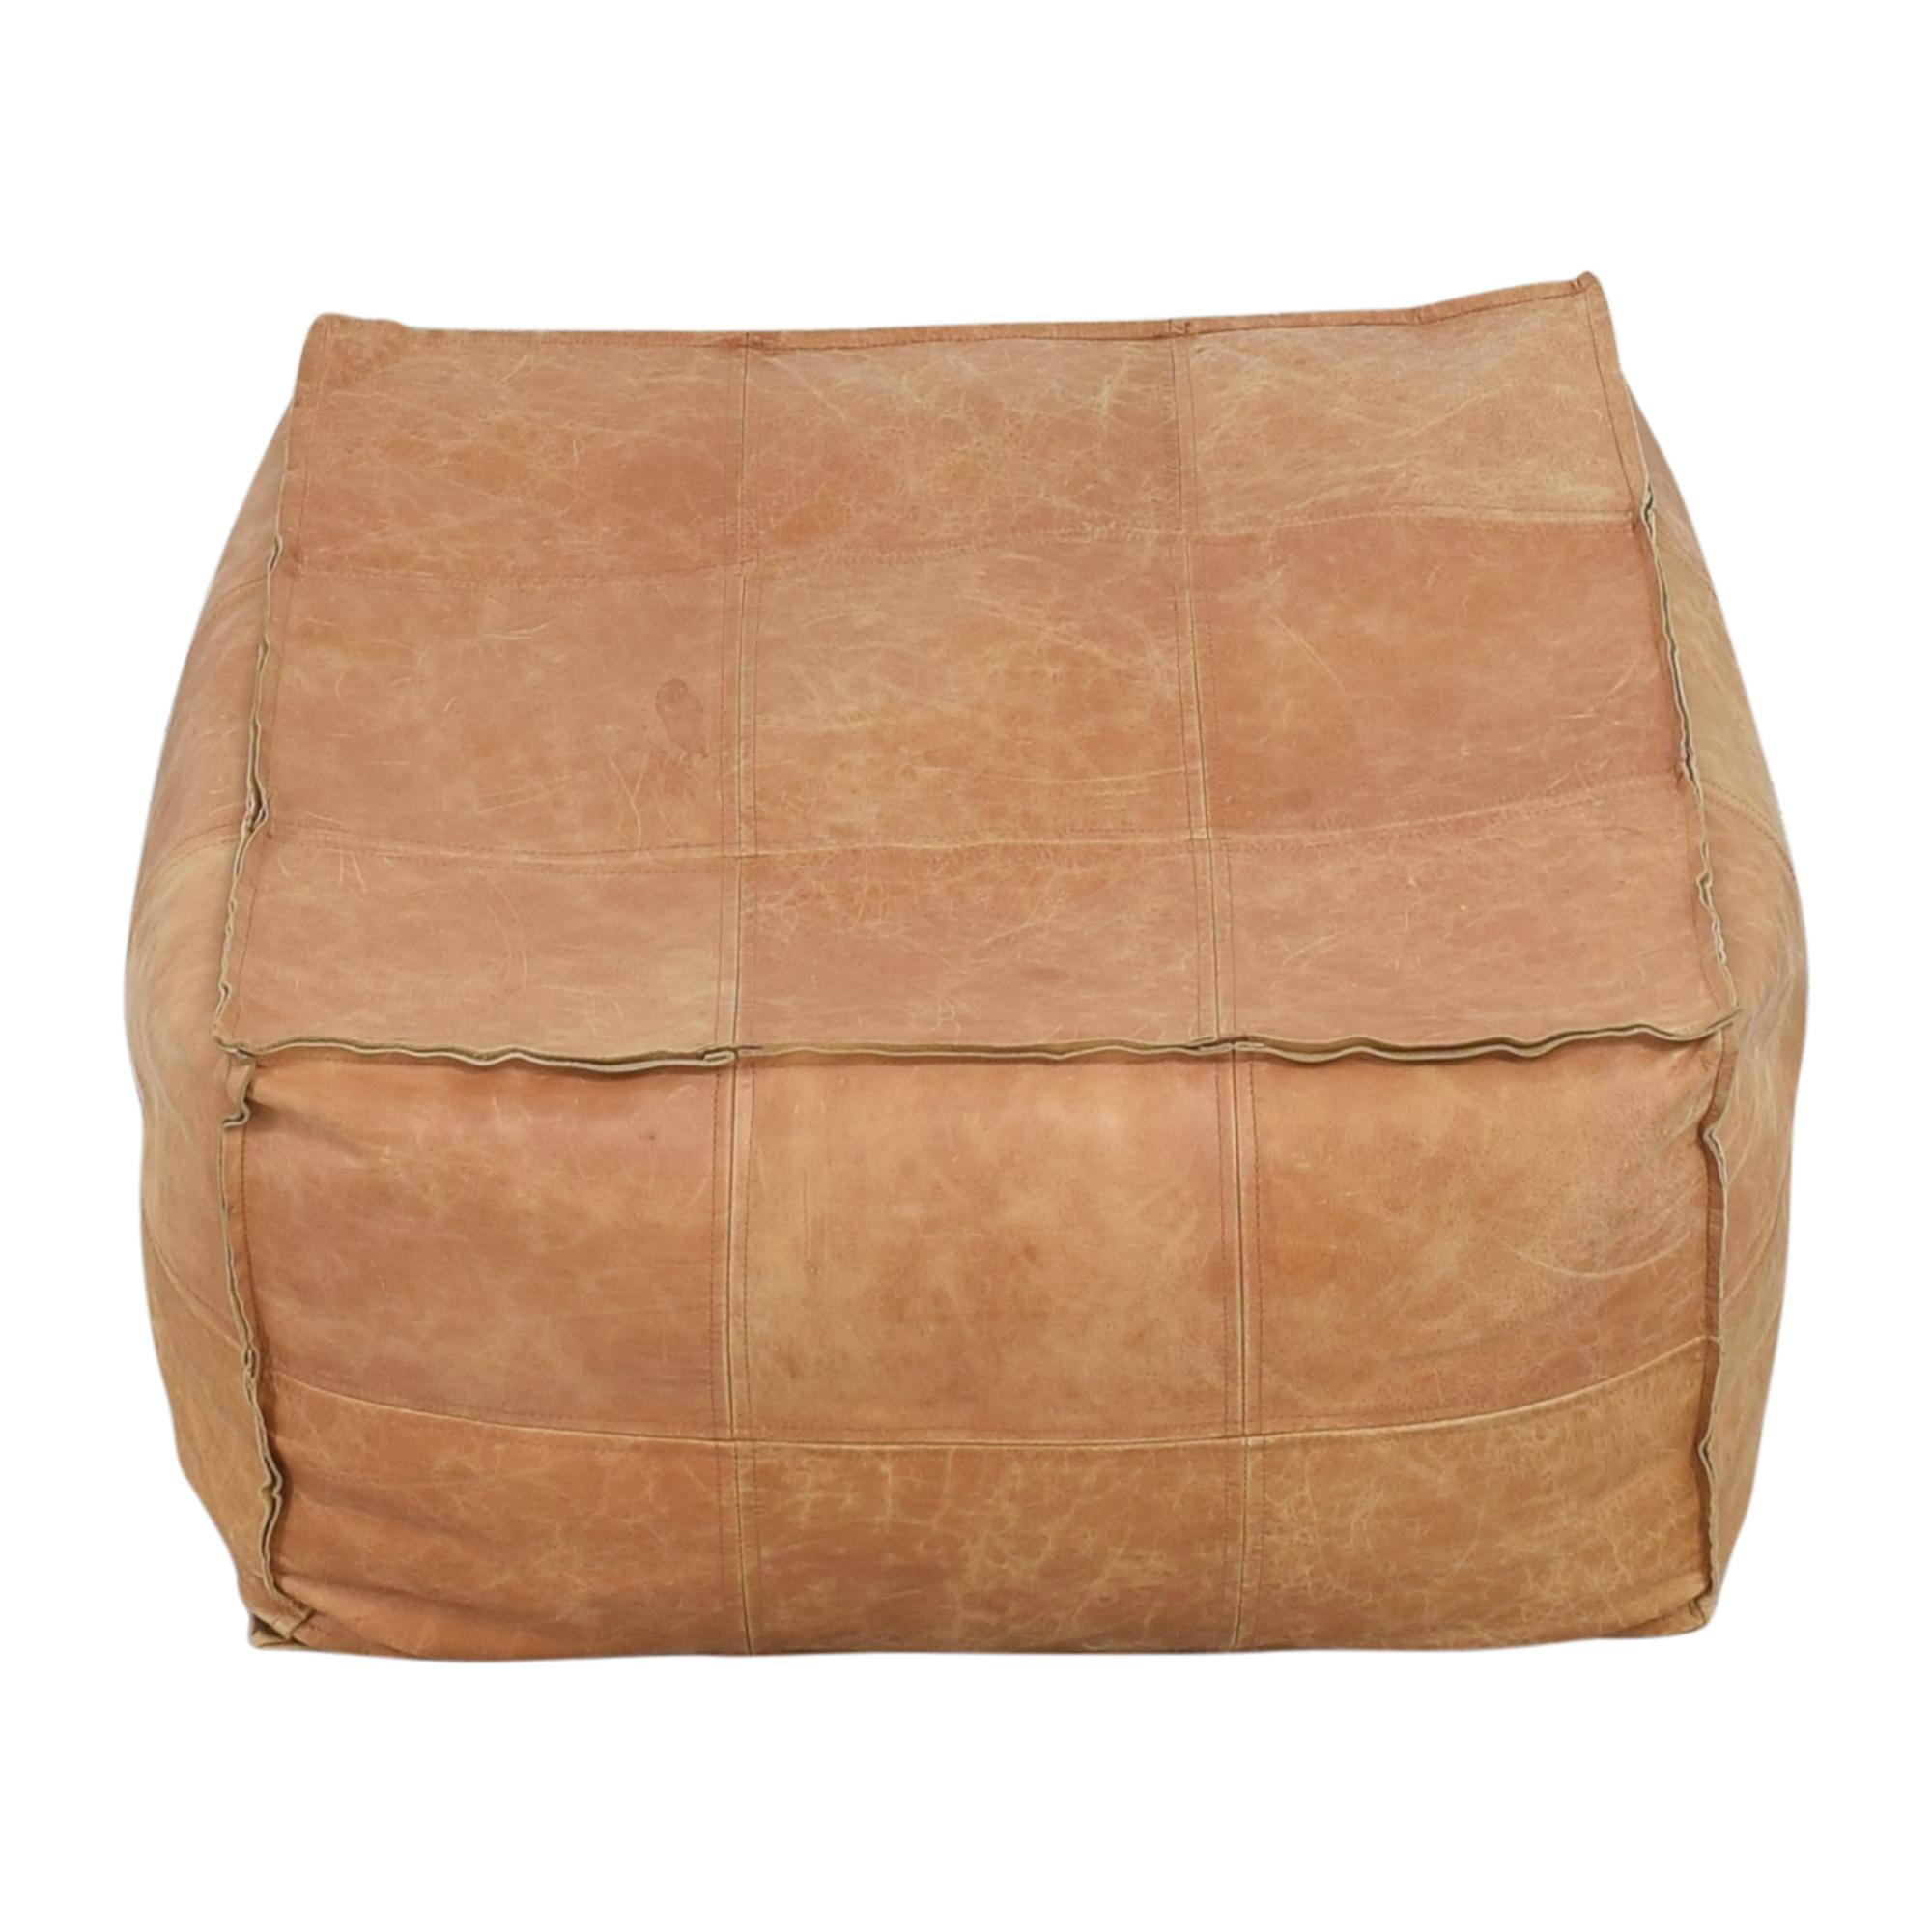 31 Off Cb2 Cb2 Medium Square Leather Ottoman Pouf Chairs